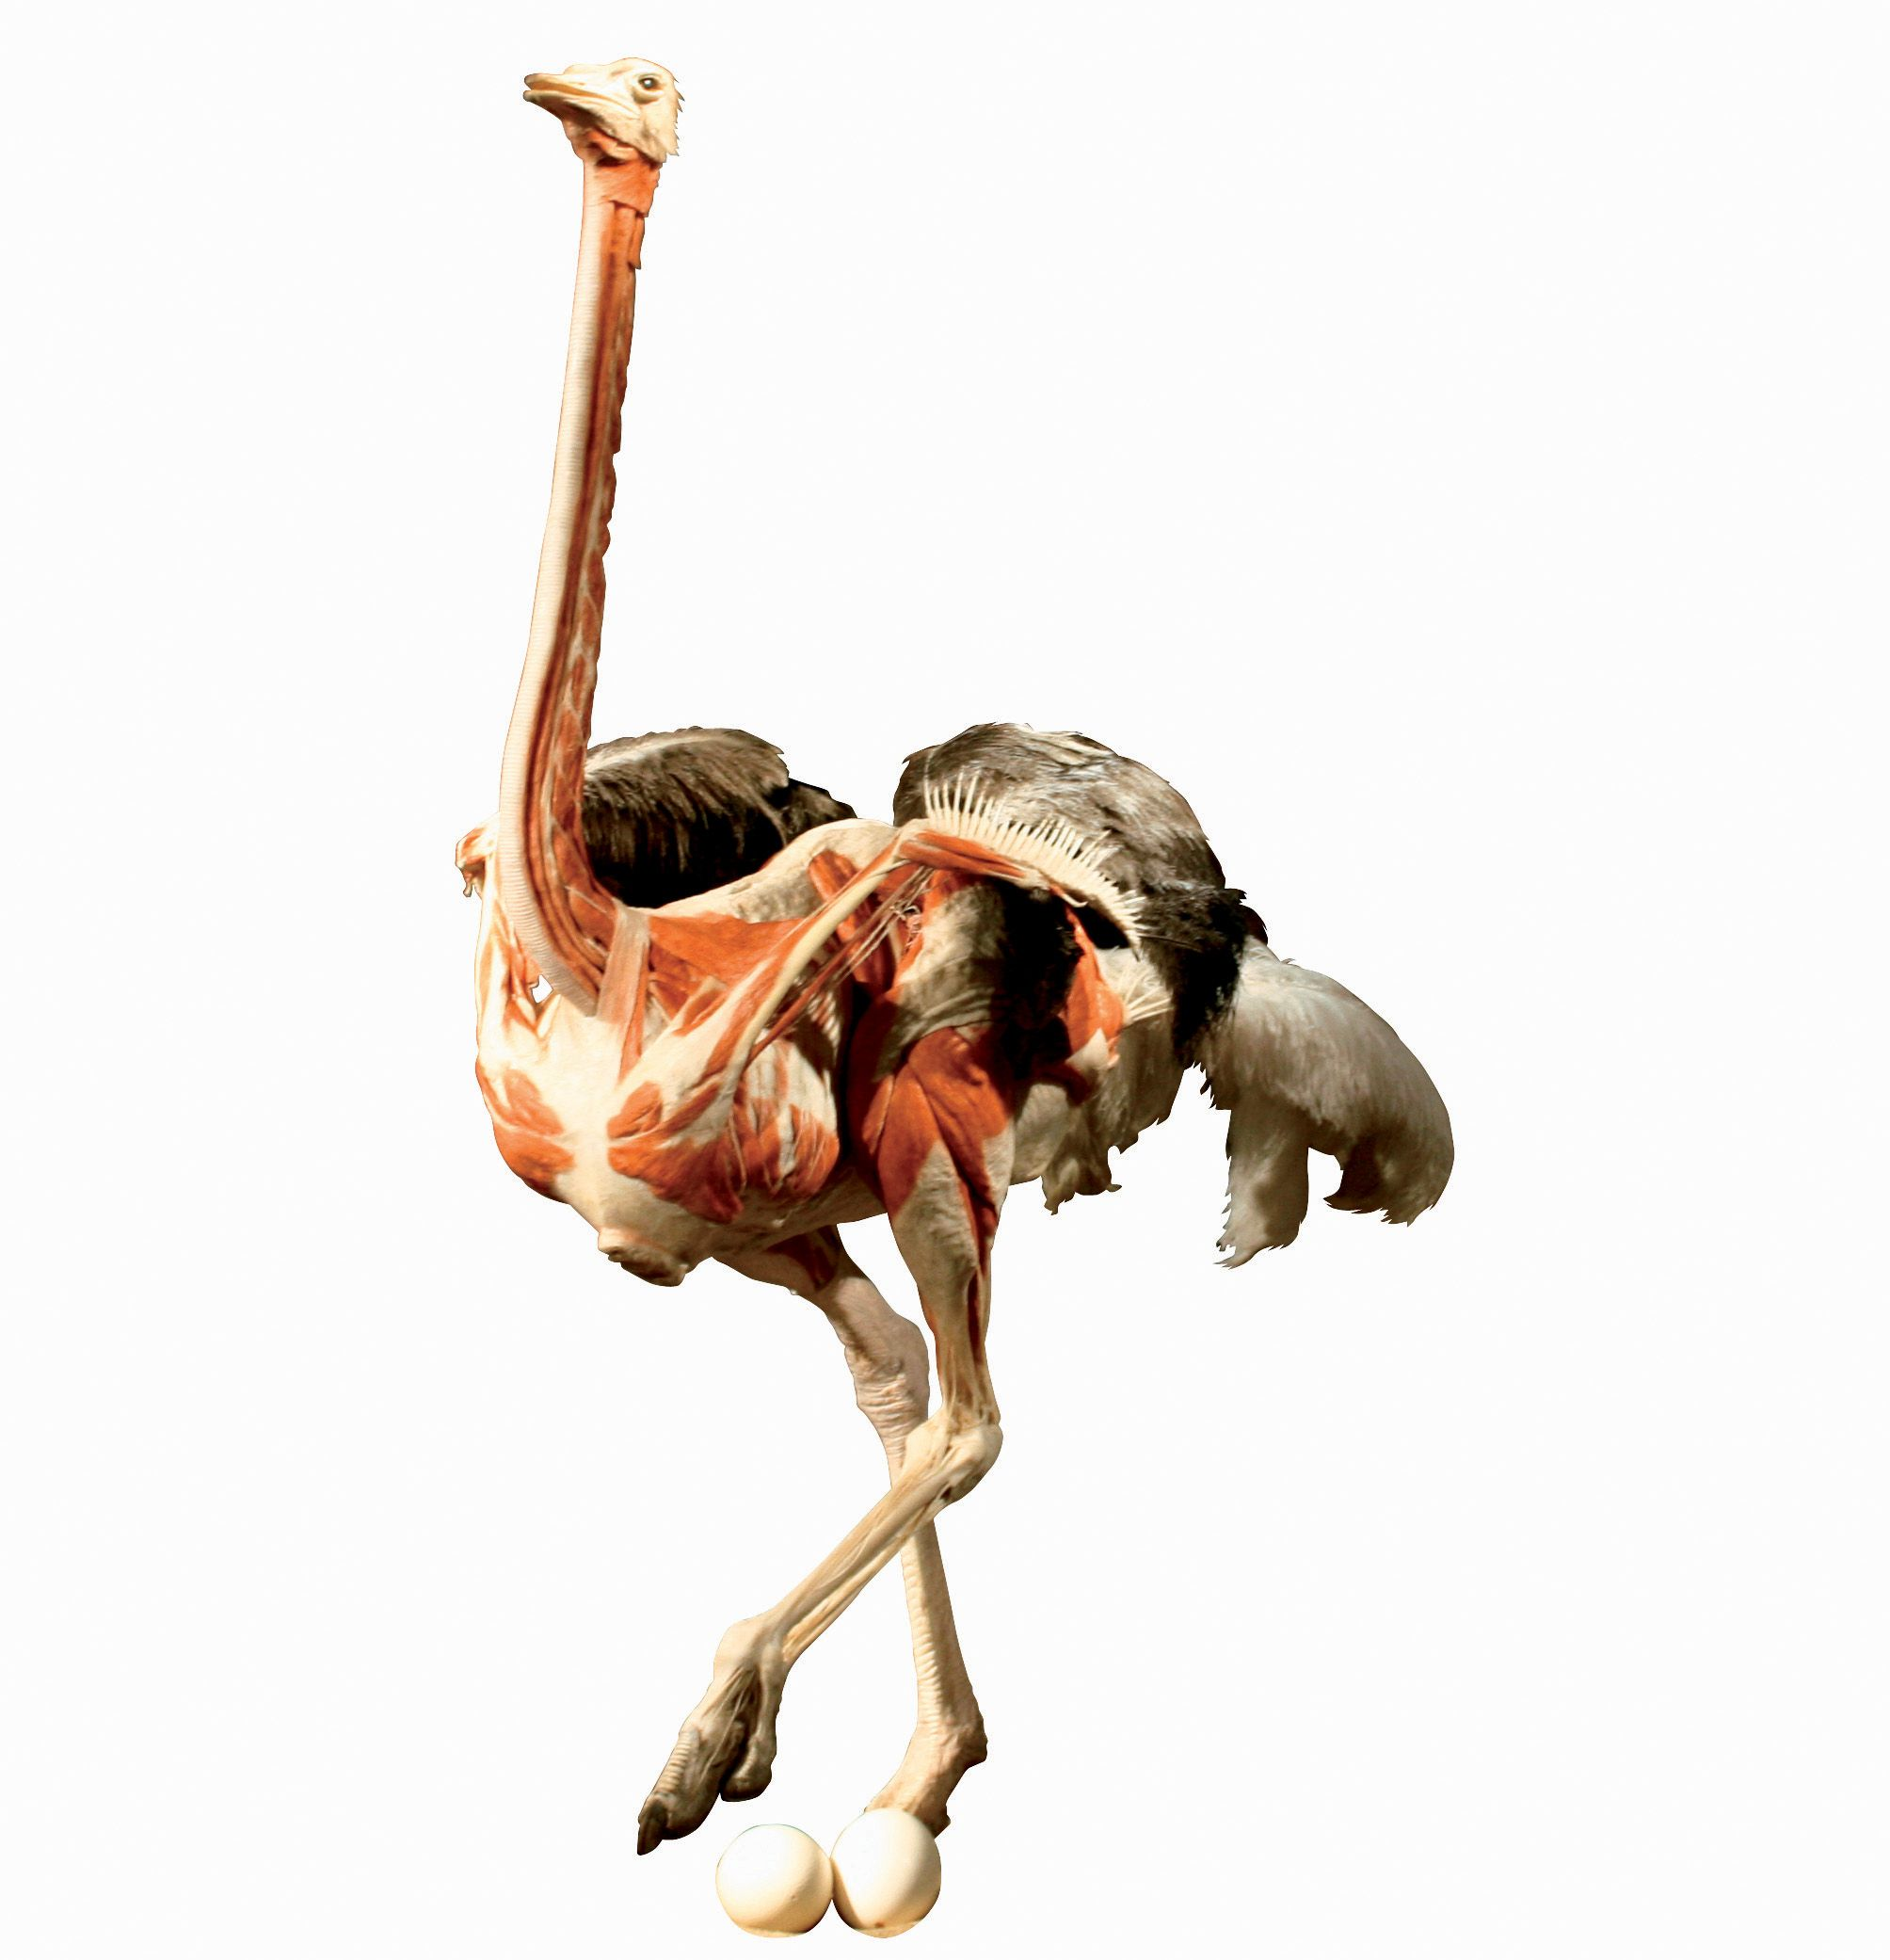 диафрагма равно строение страуса фото телевизоры